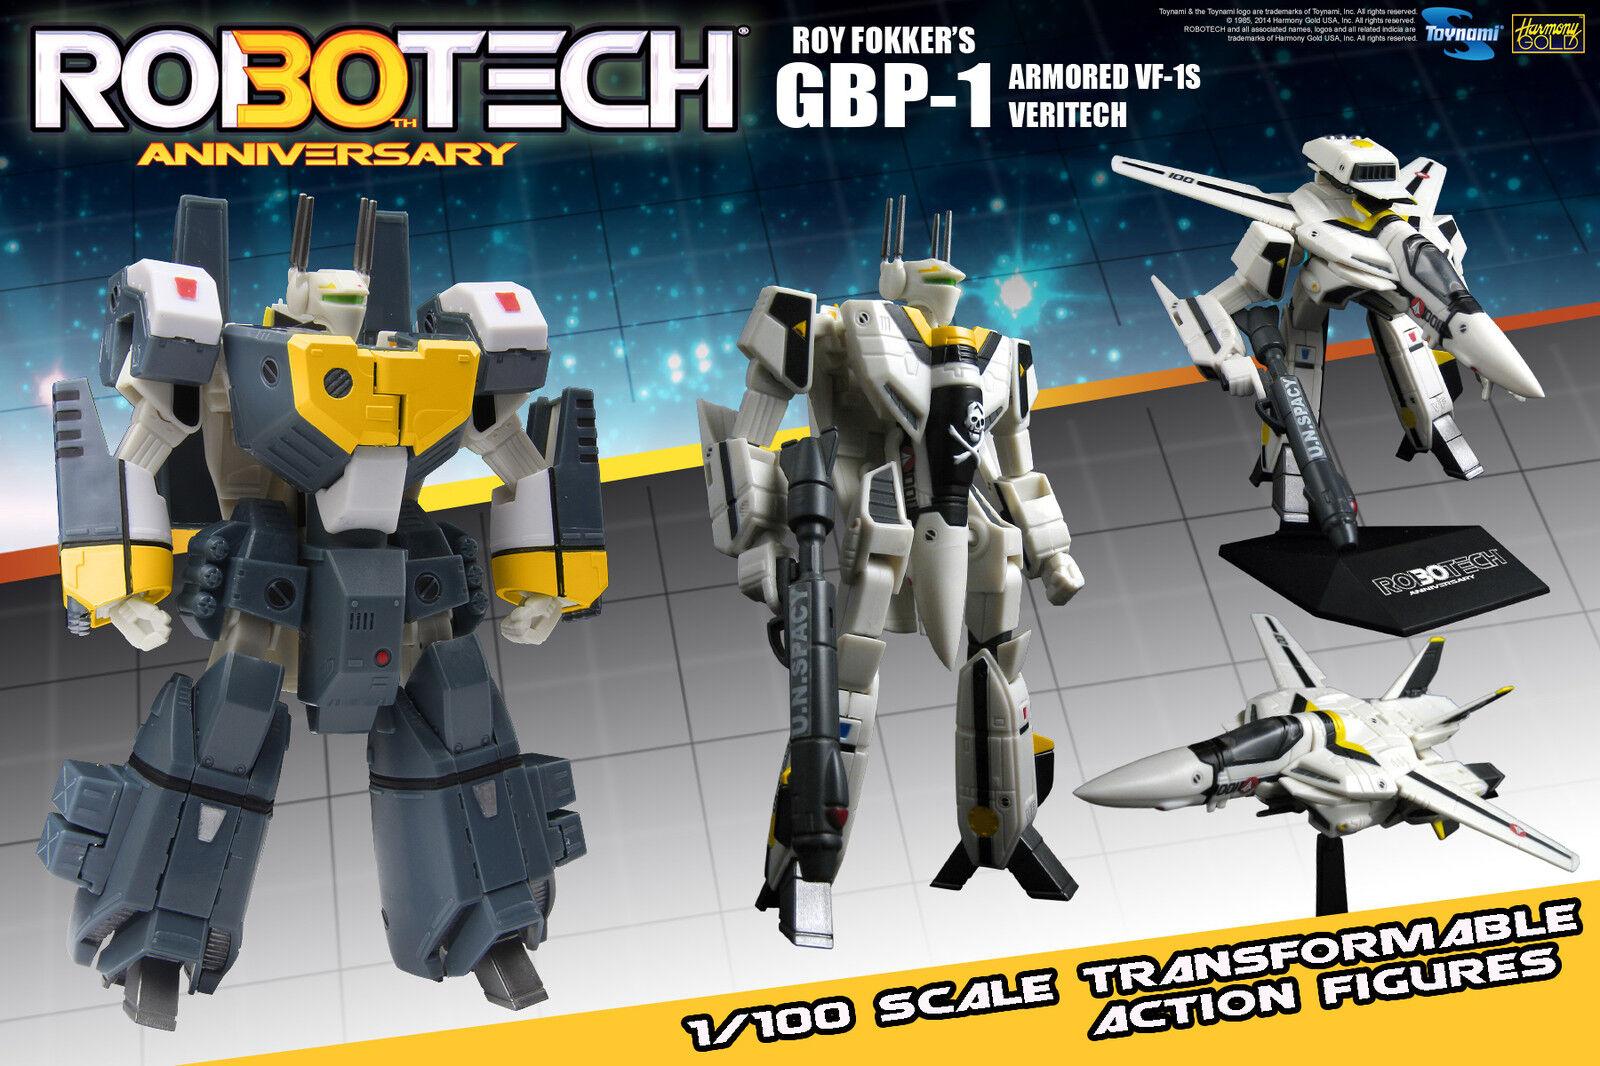 Macross Robotech VF-1S GBP-1 Heavy ArmGoldt Veritech 1 100 Transformable- New